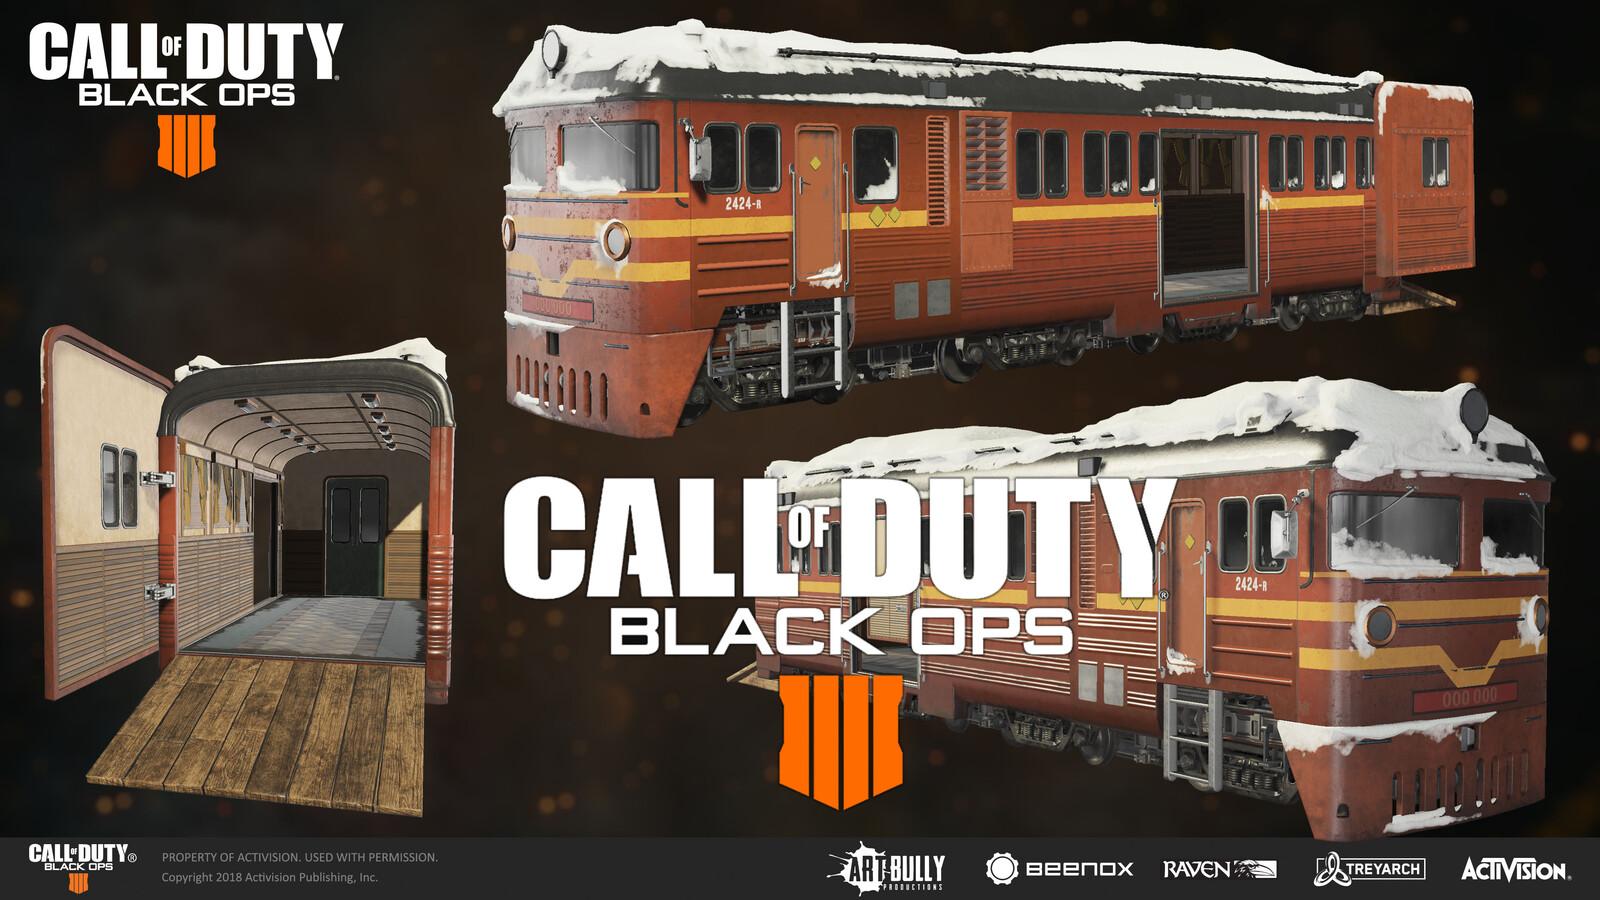 Call Of Duty Black Ops 4 Train wagon